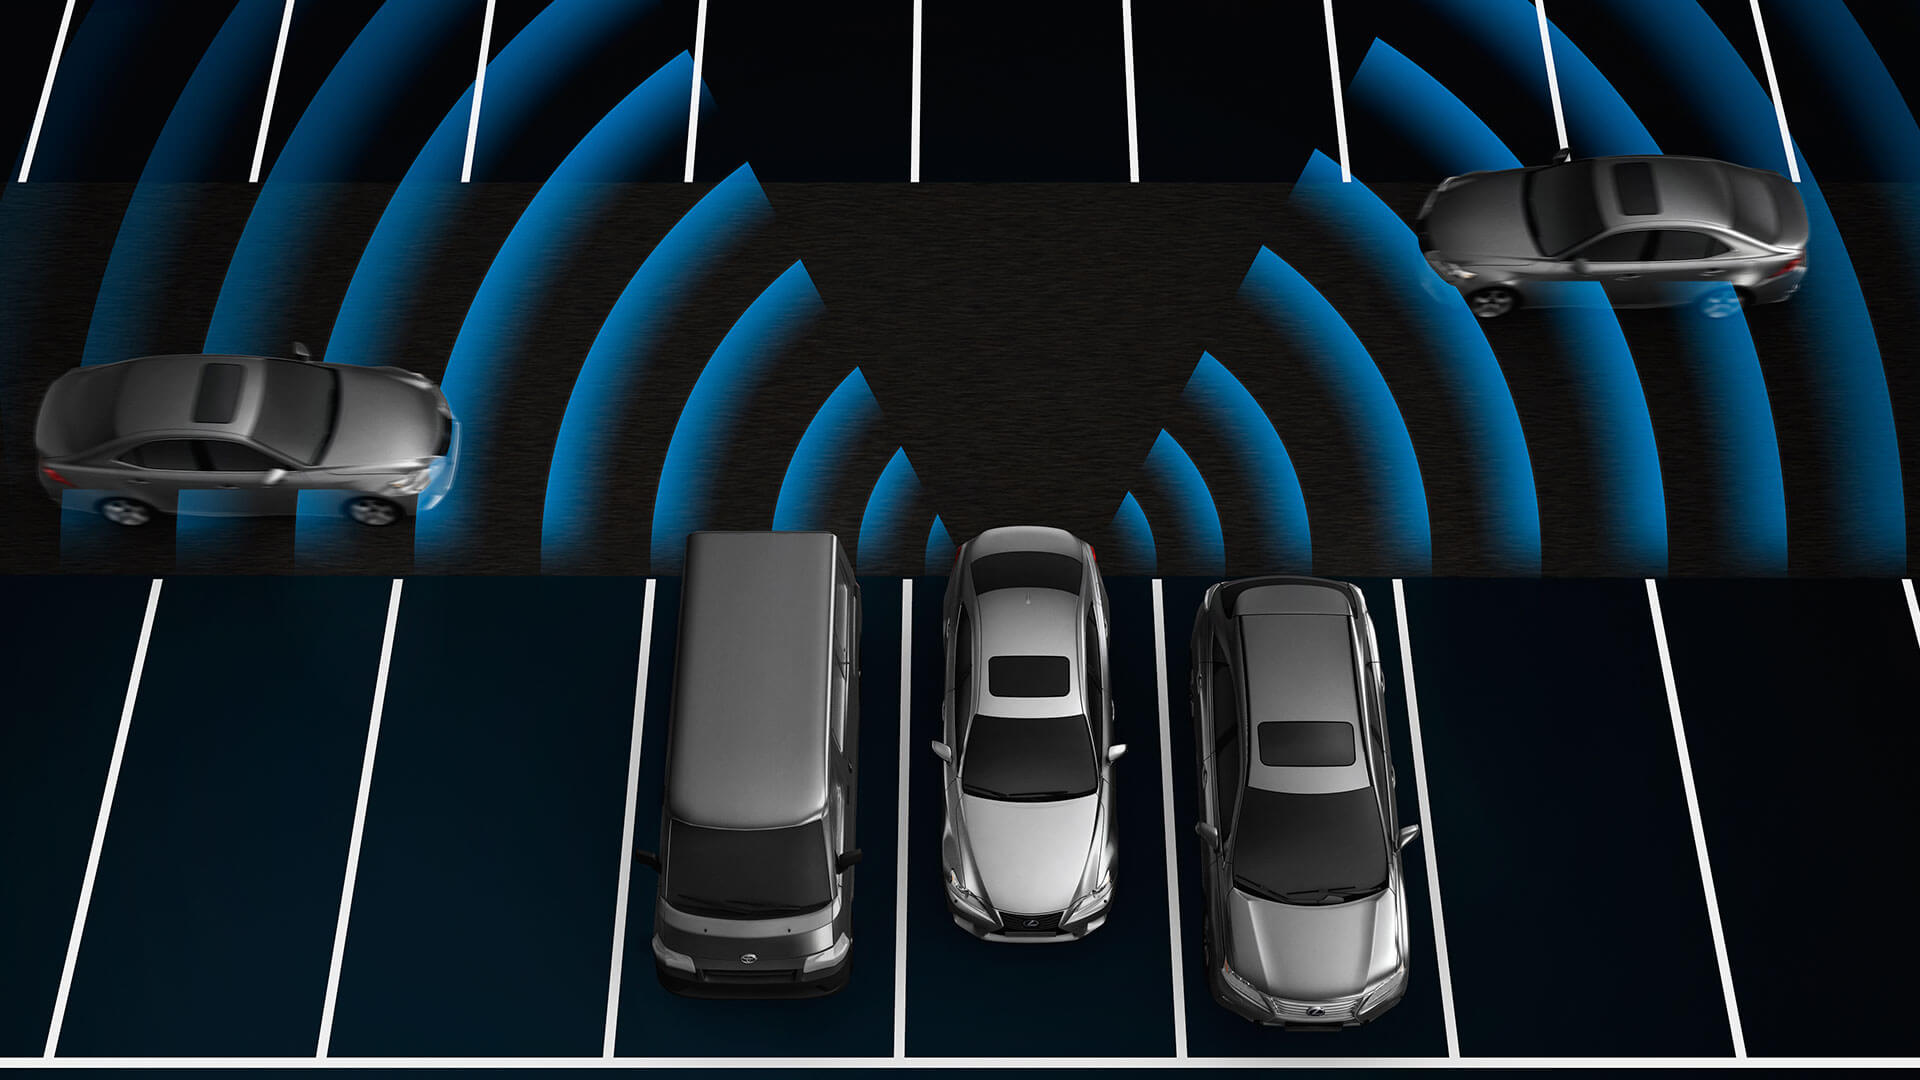 2017 lexus is 300h features rear cross traffic alert